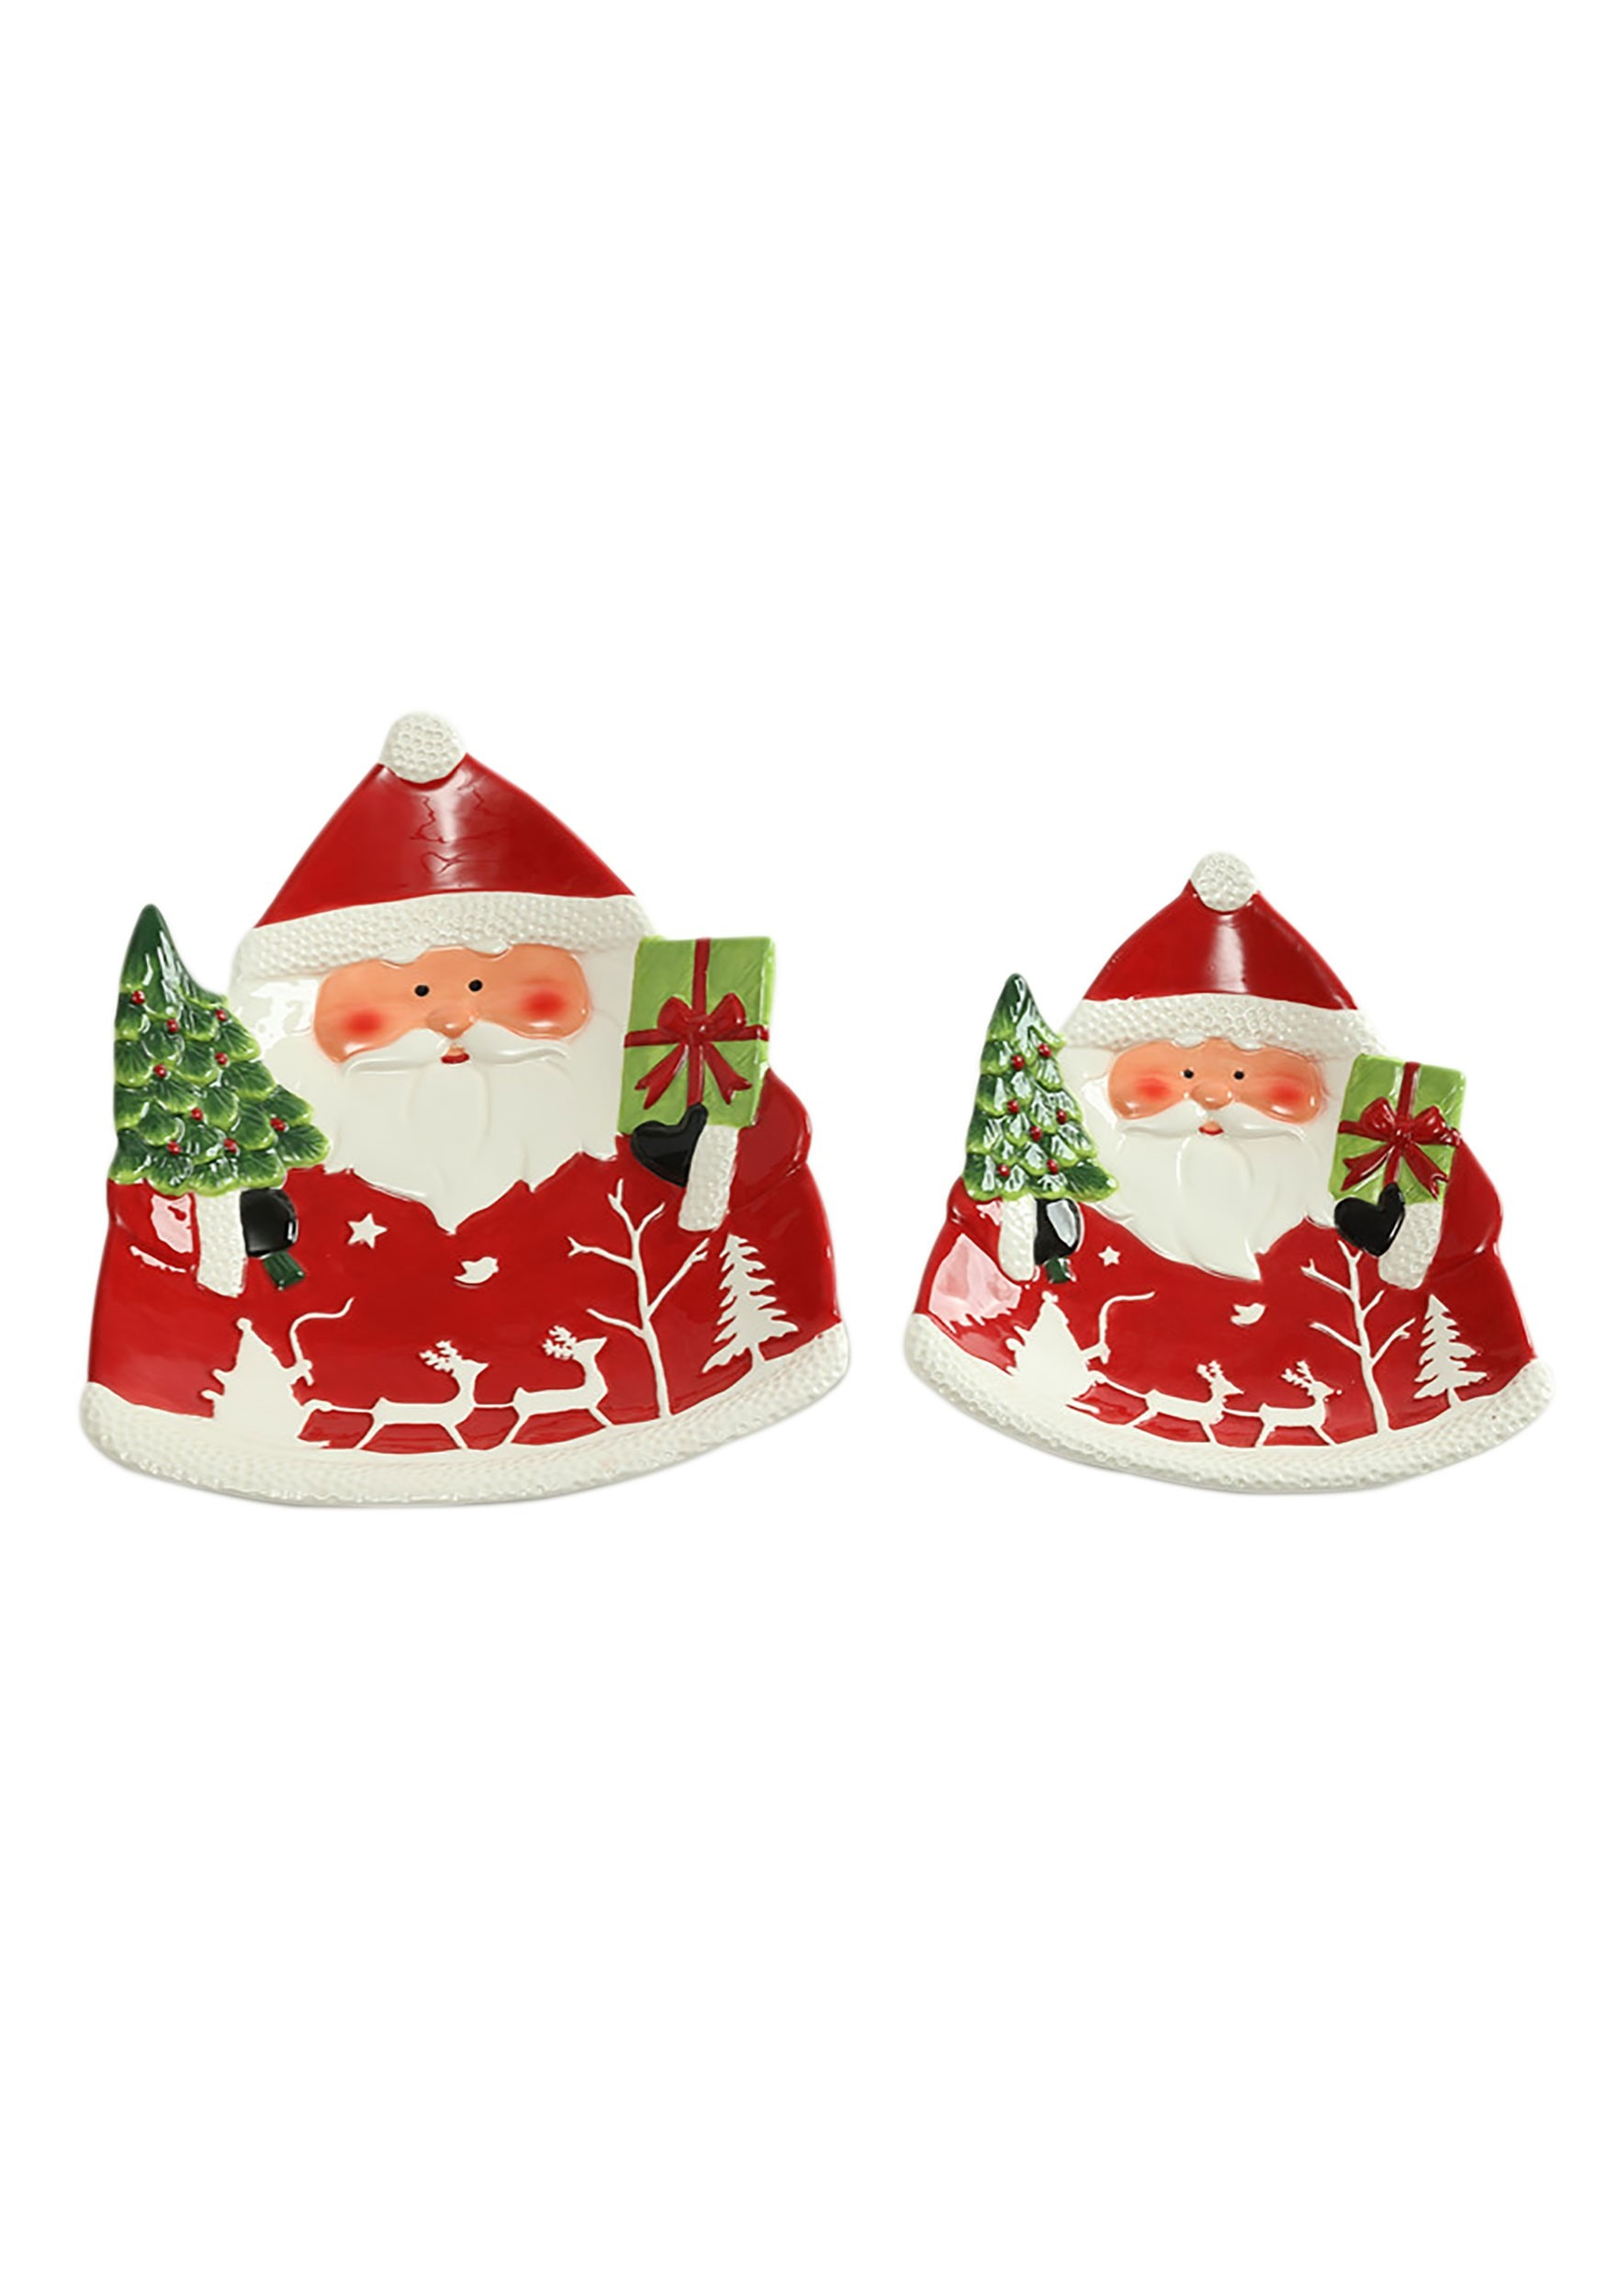 Santa Christmas Ceramic Platter Set